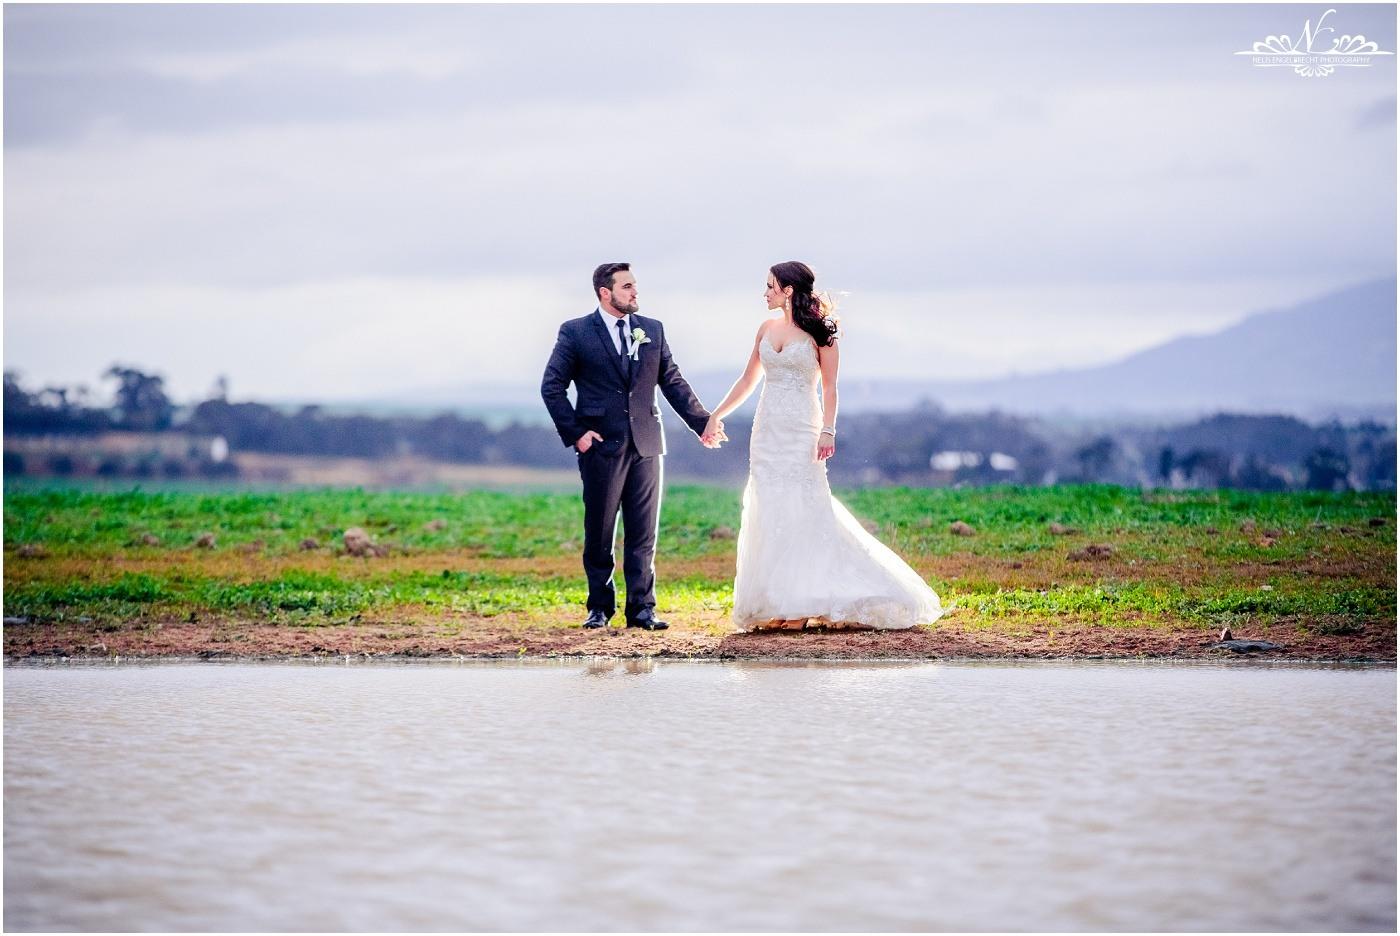 Eensgezind-Wedding-Photos-Nelis-Engelbrecht-Photography-158